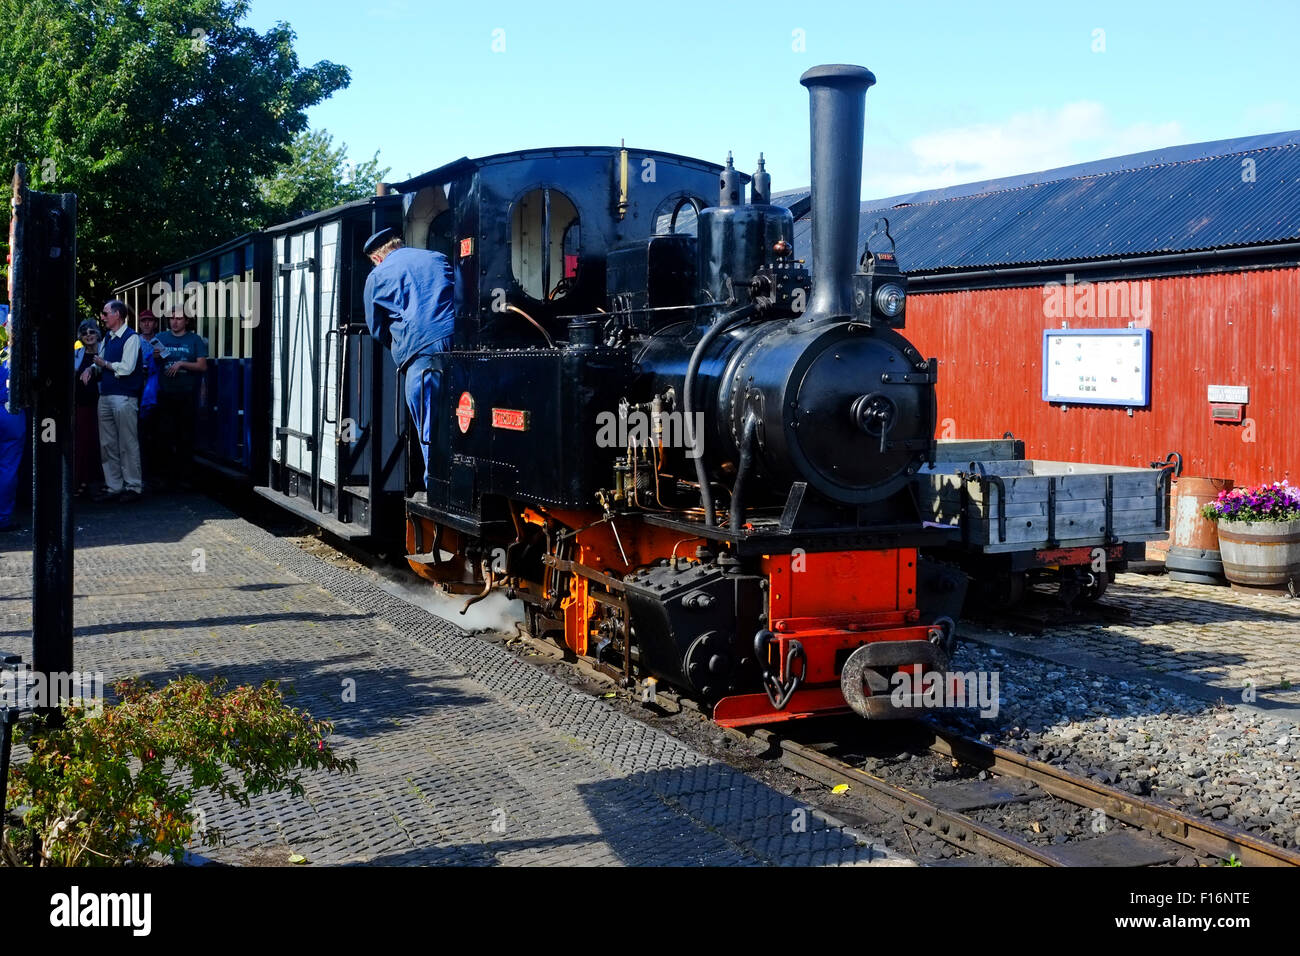 West Lancs Light Railway, locomotive 'Utrillas' - Stock Image